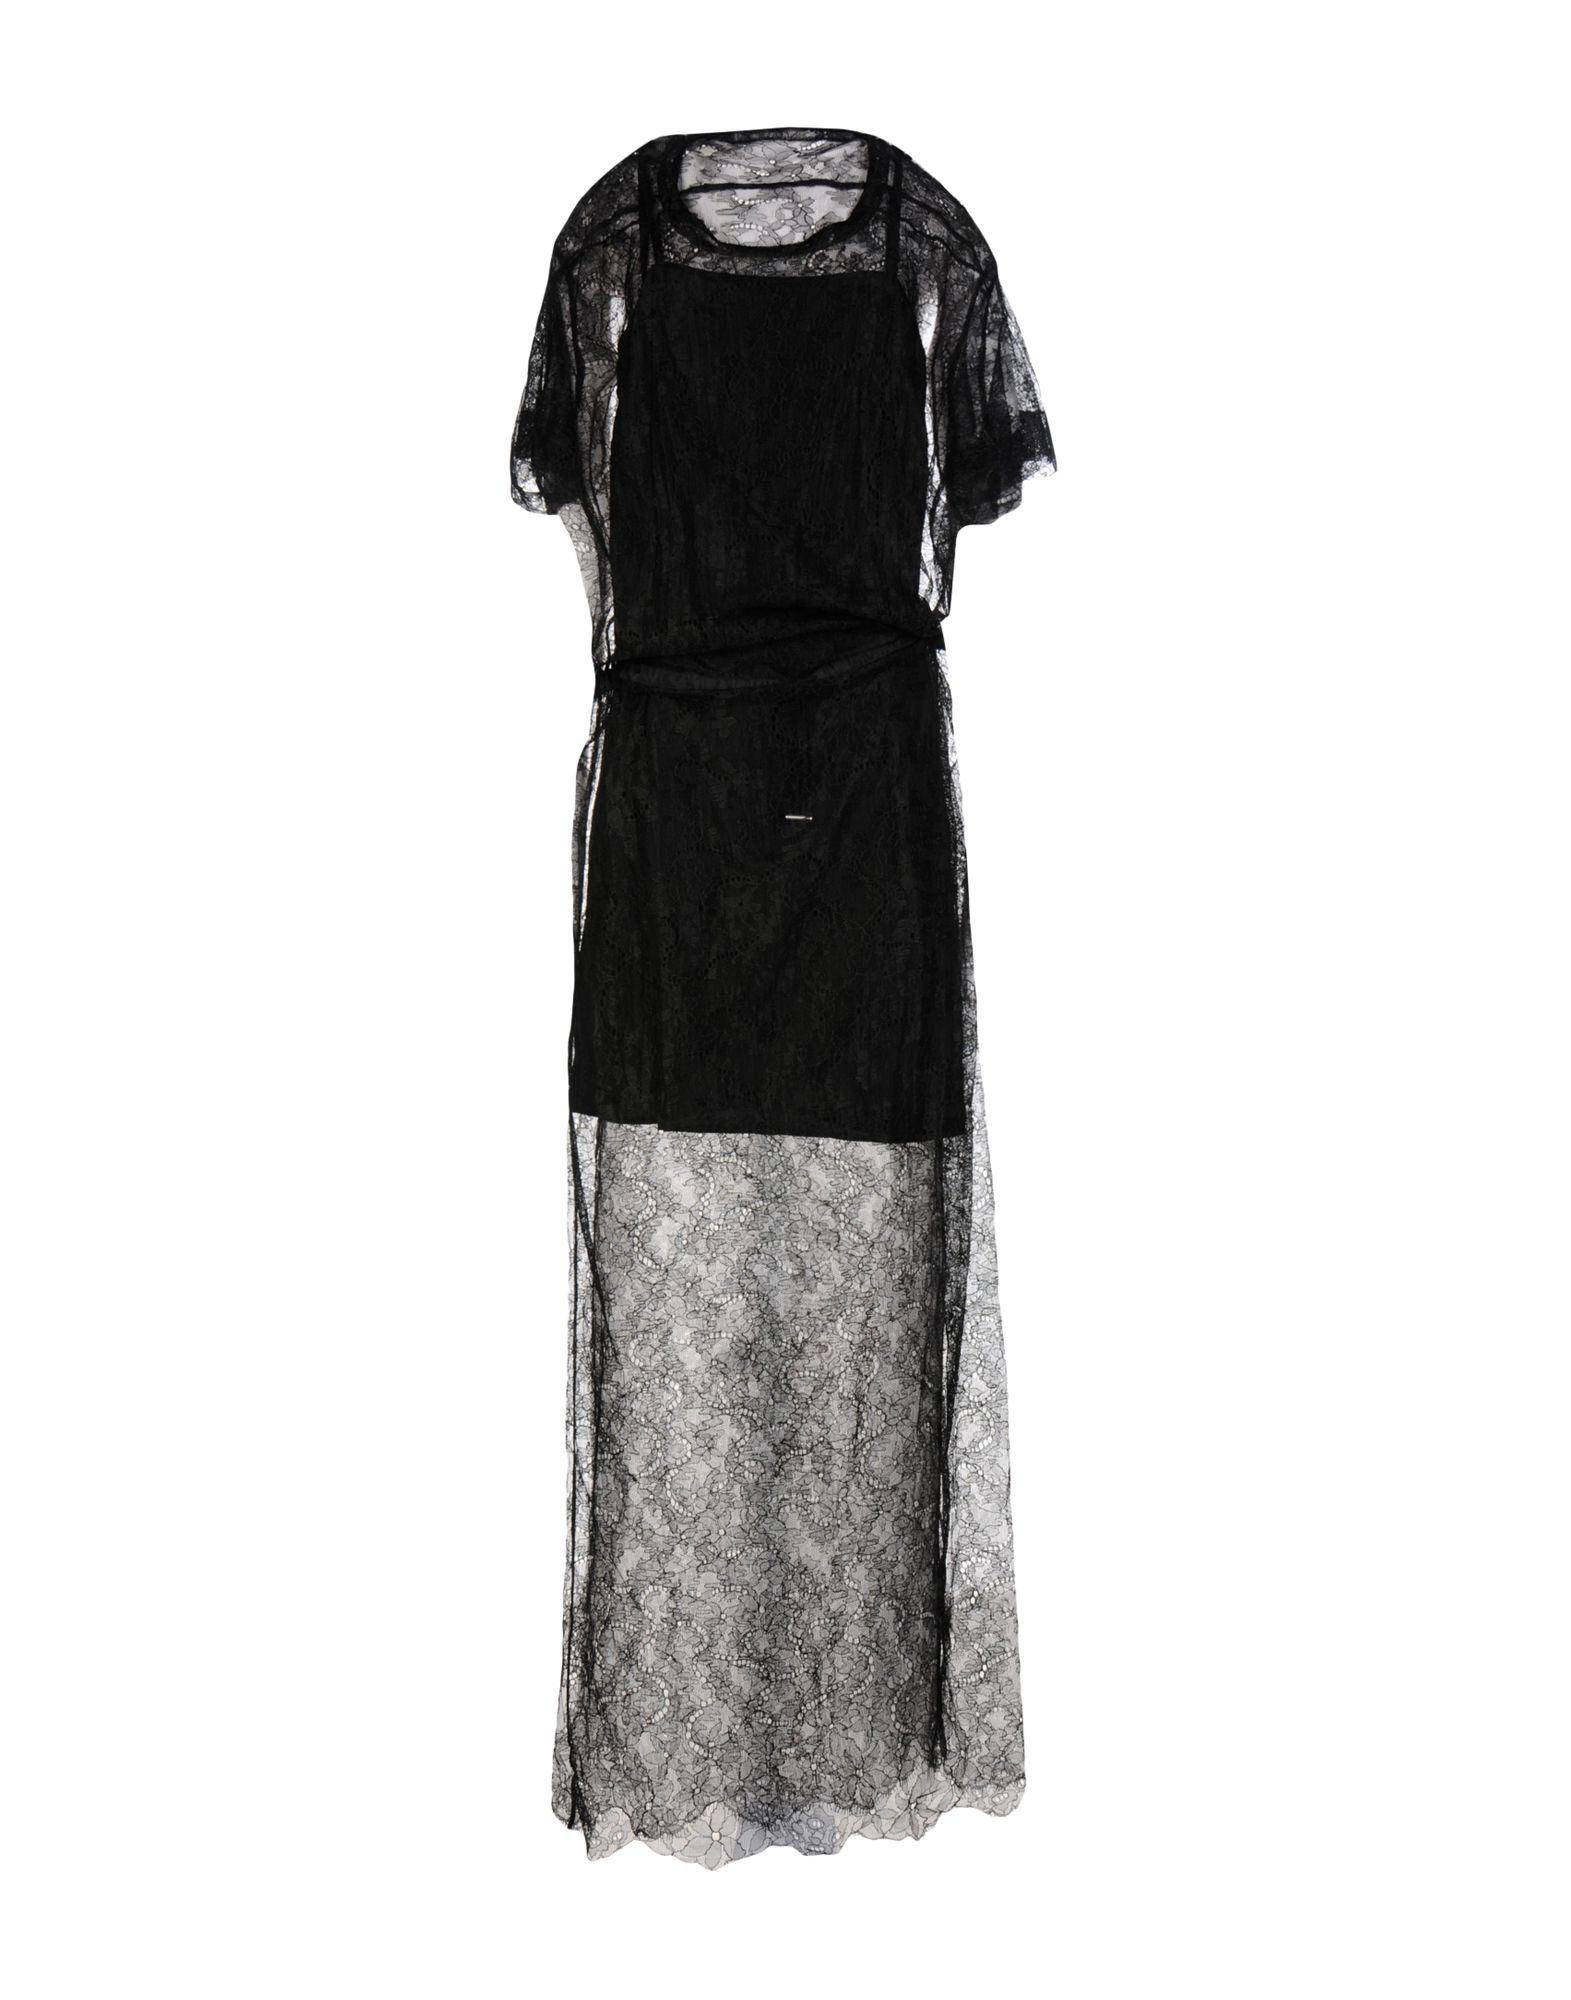 DRESSES Maison Margiela Black Woman Viscose